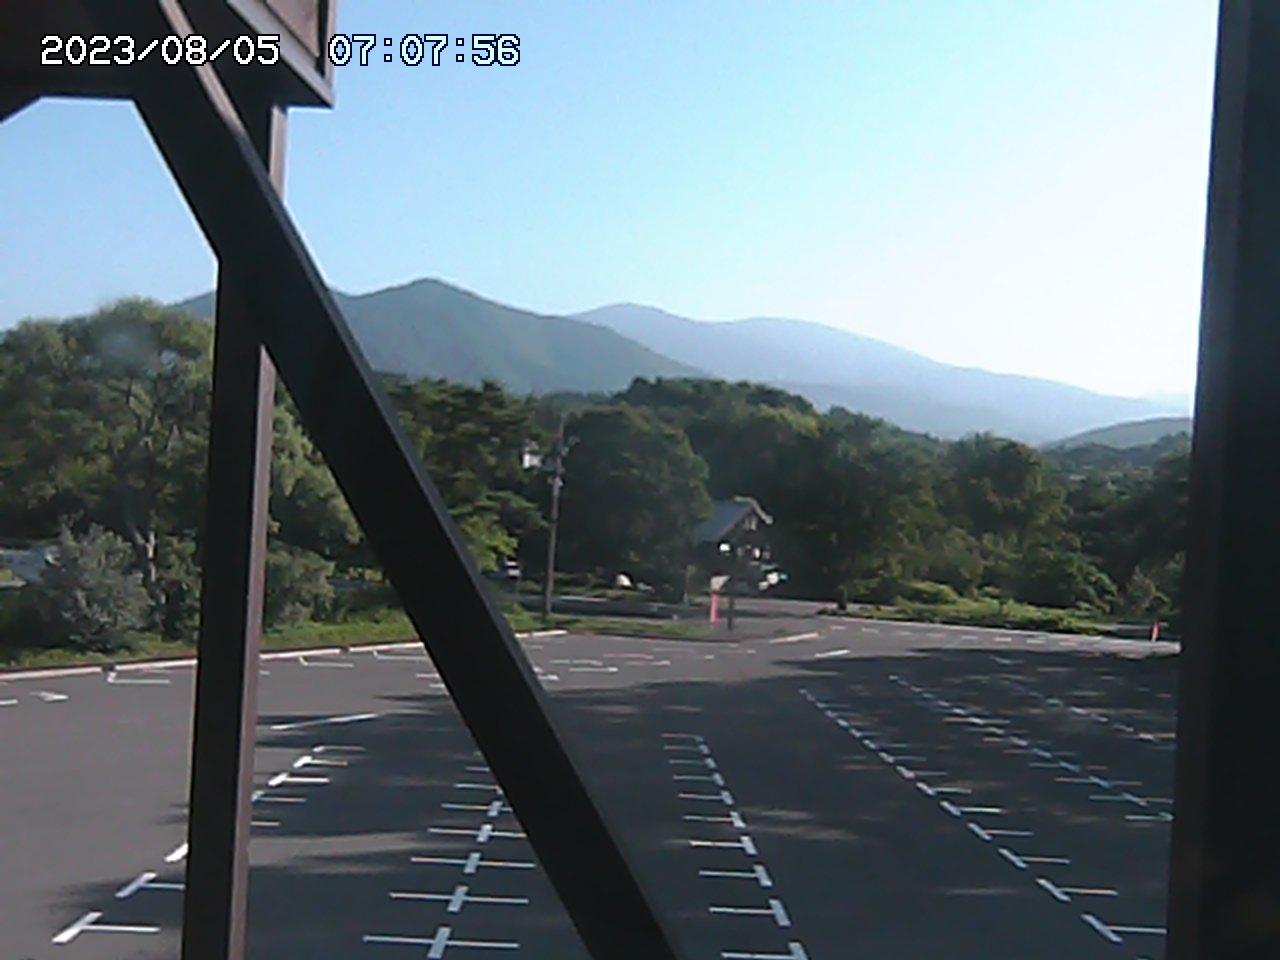 裏磐梯観光プラザ ライブカメラ